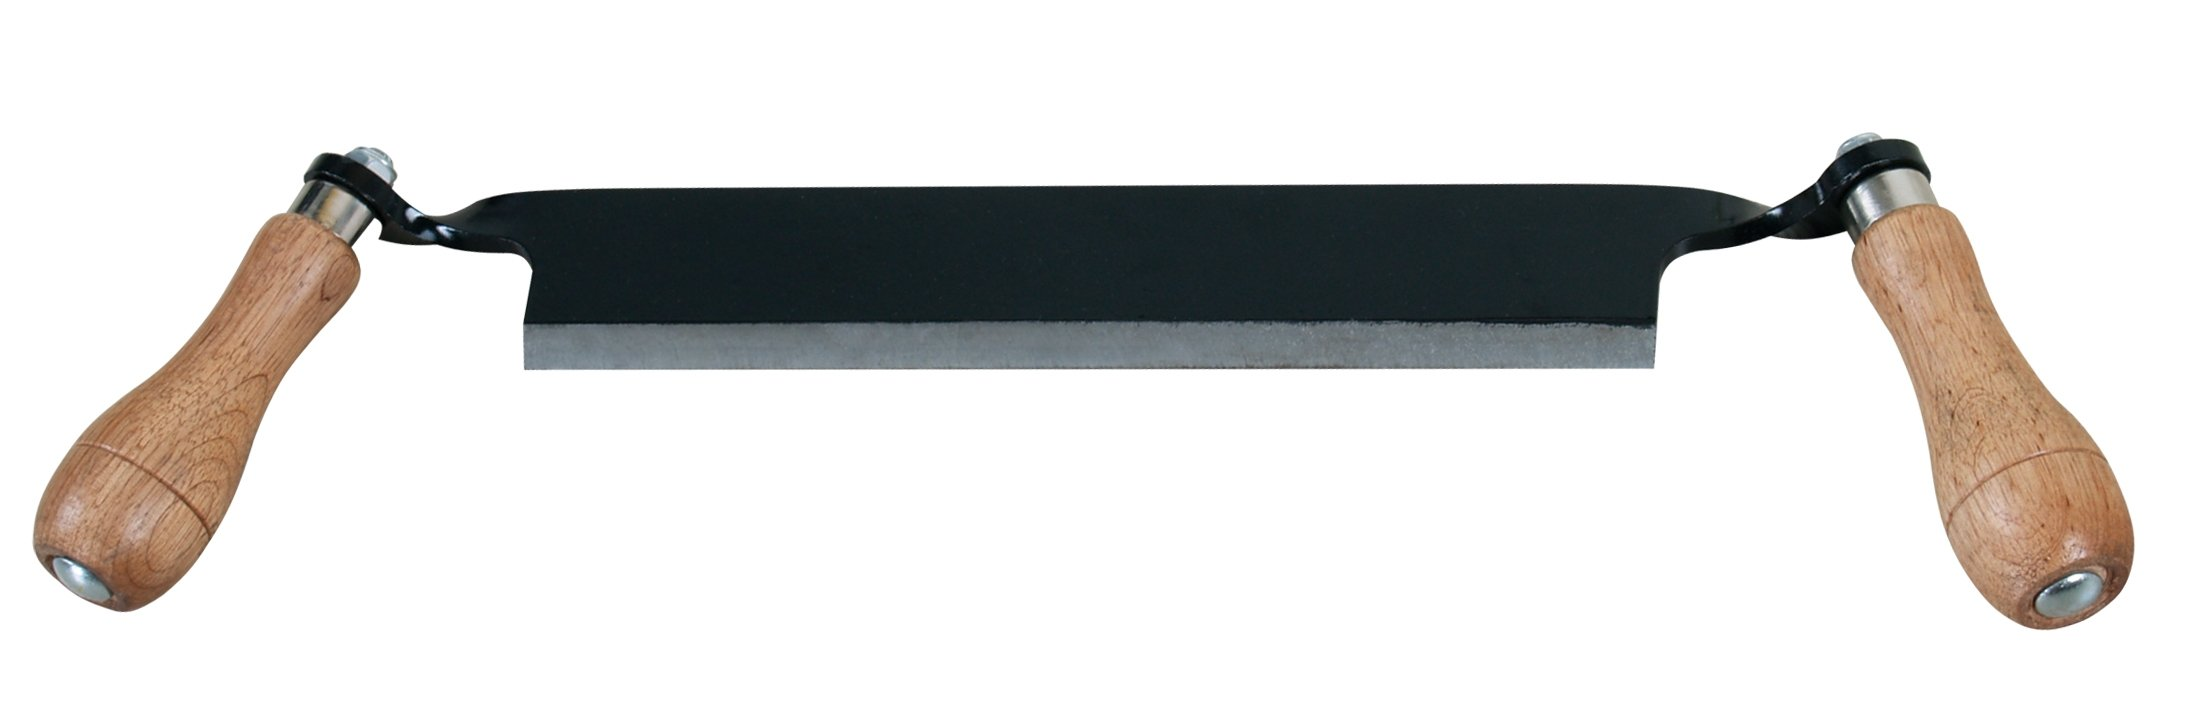 Timber Tuff TMB-05DS Straight Draw Shave Tool, 5'', Black